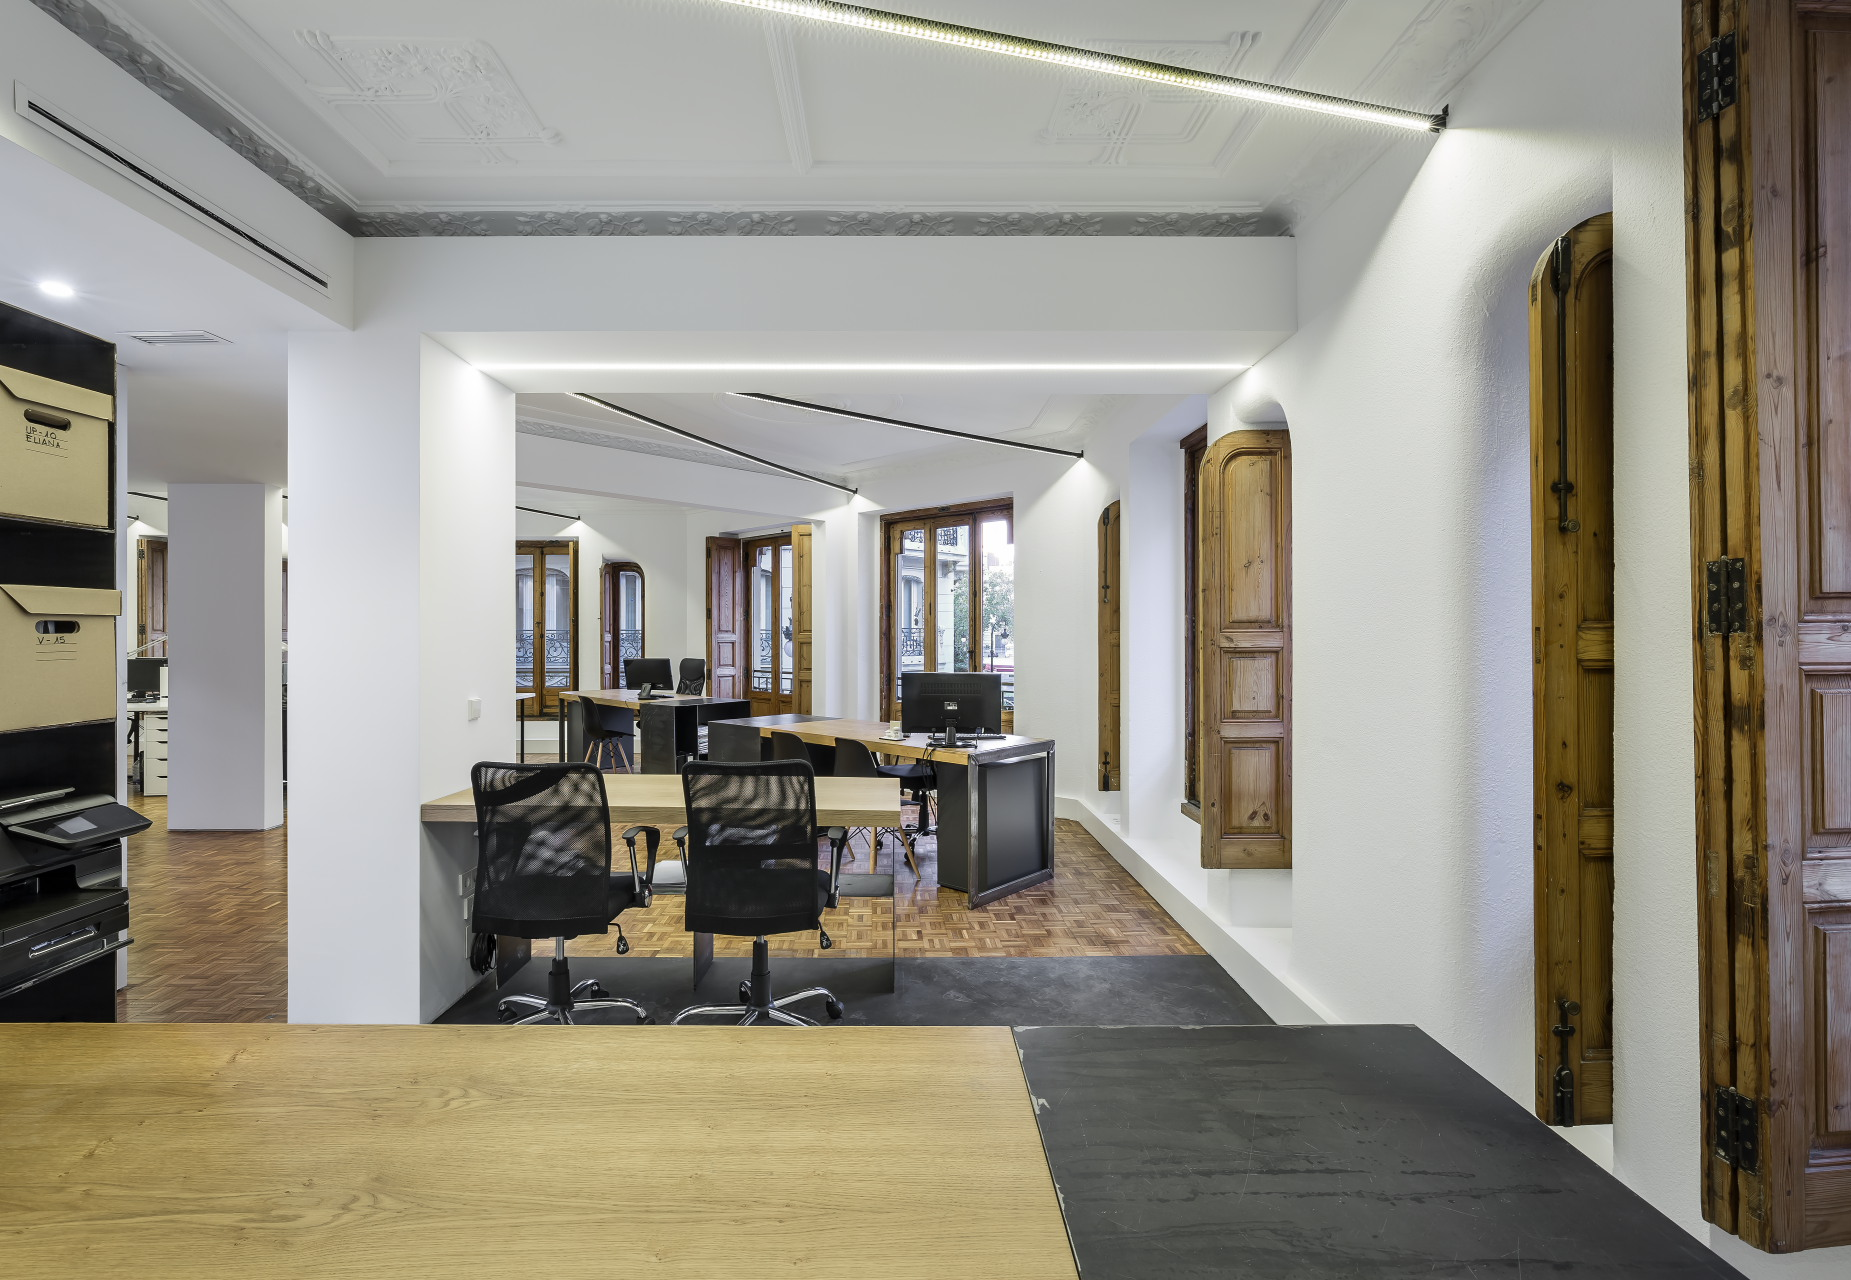 fotografia-arquitectura-interiorismo-valencia-german-cabo-viraje-estudio-pujol (10)